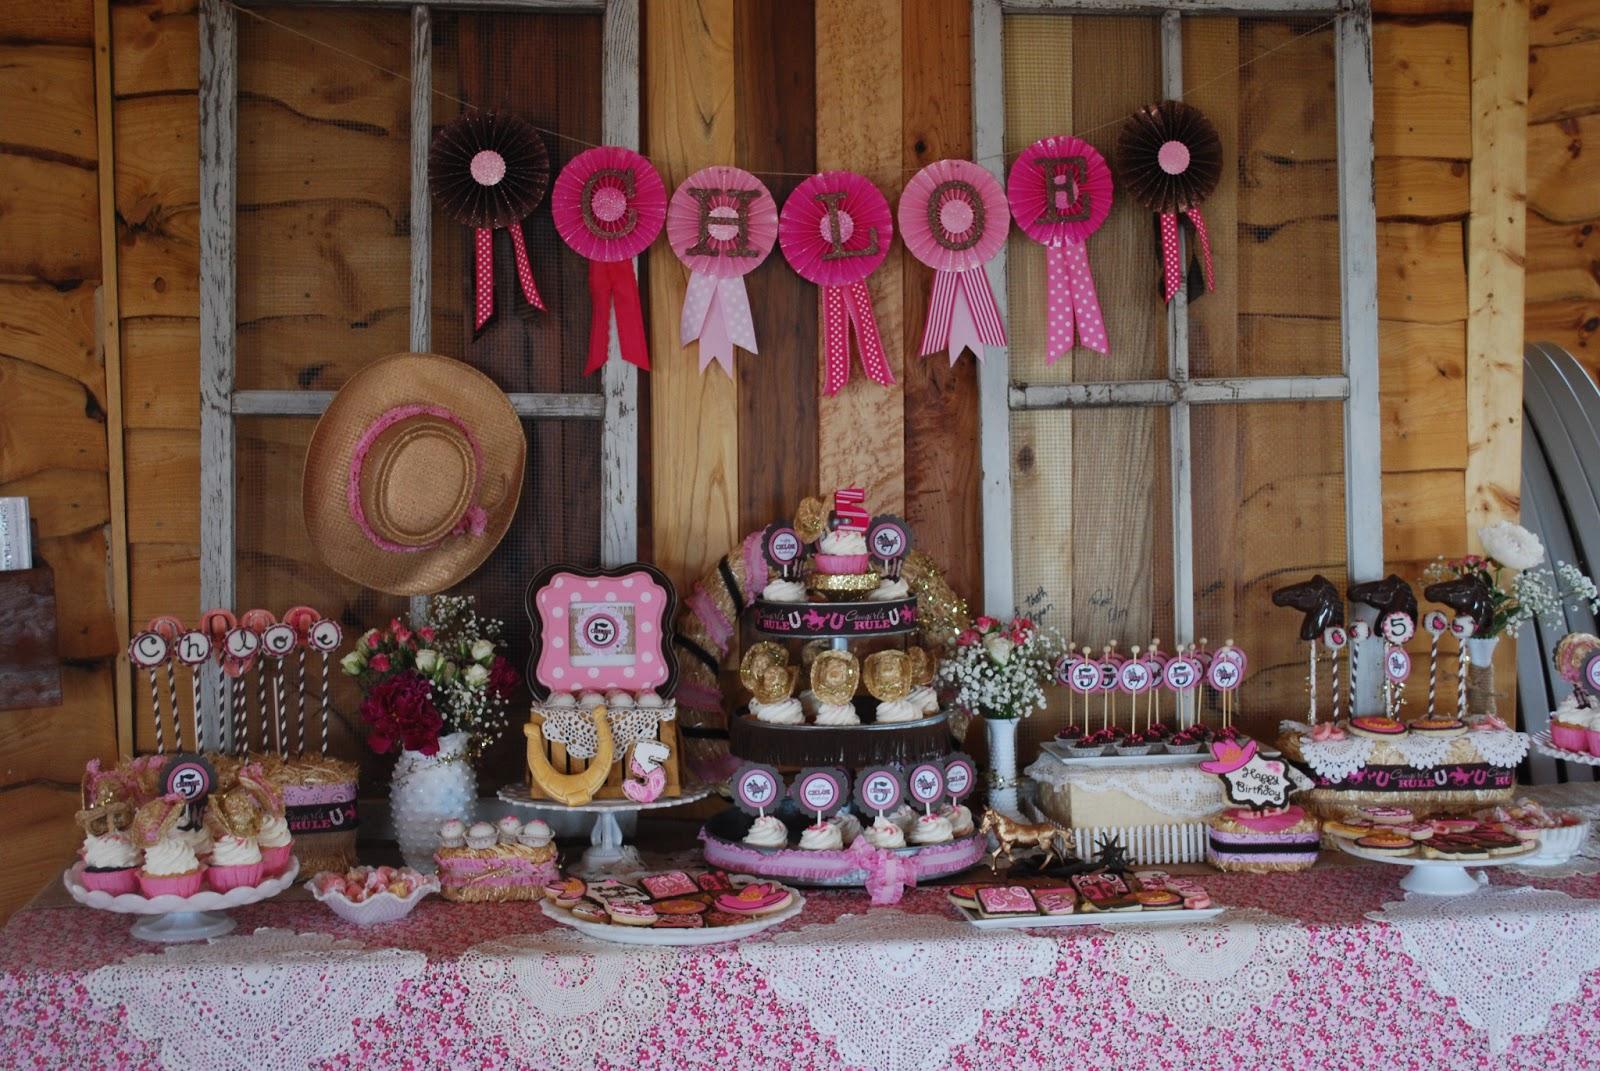 Cowgirl Birthday Decorations Similiar Cowgirl Party Ideas For Girls Keywords